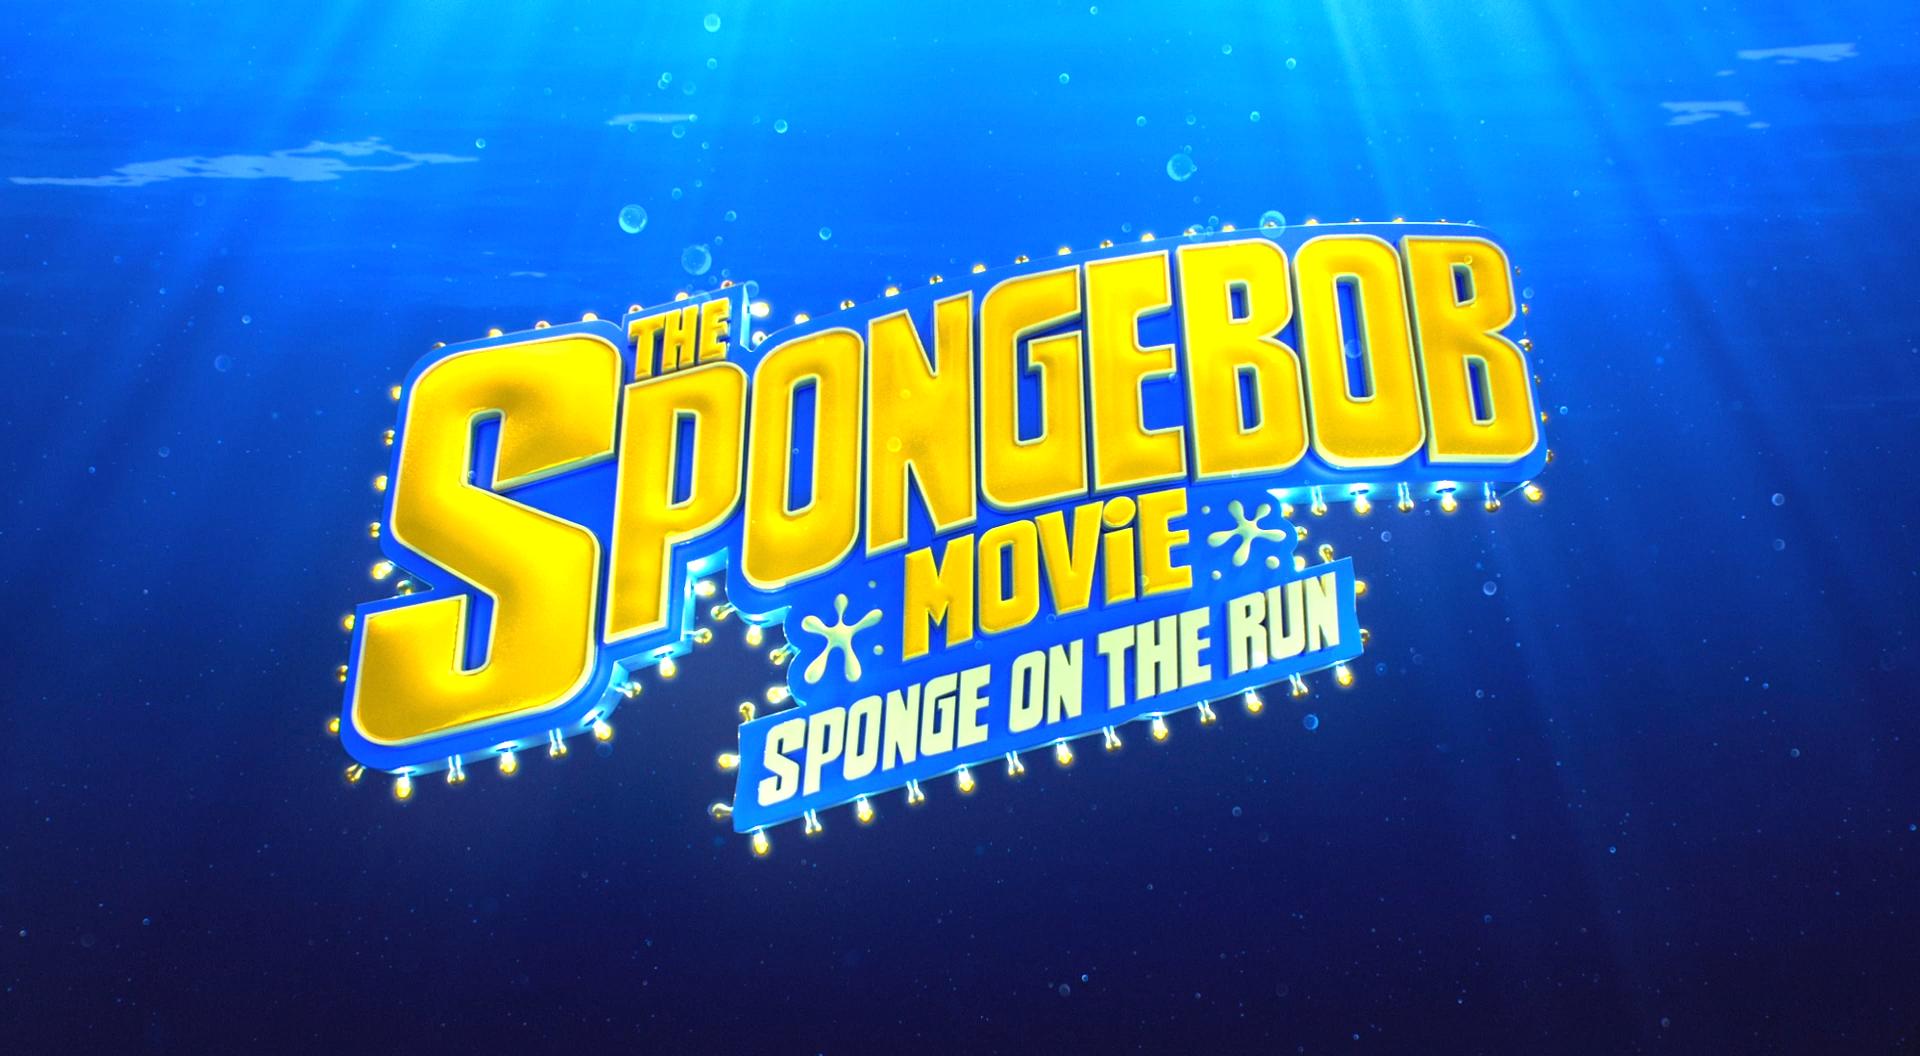 The SpongeBob Movie: Sponge on the Run/gallery